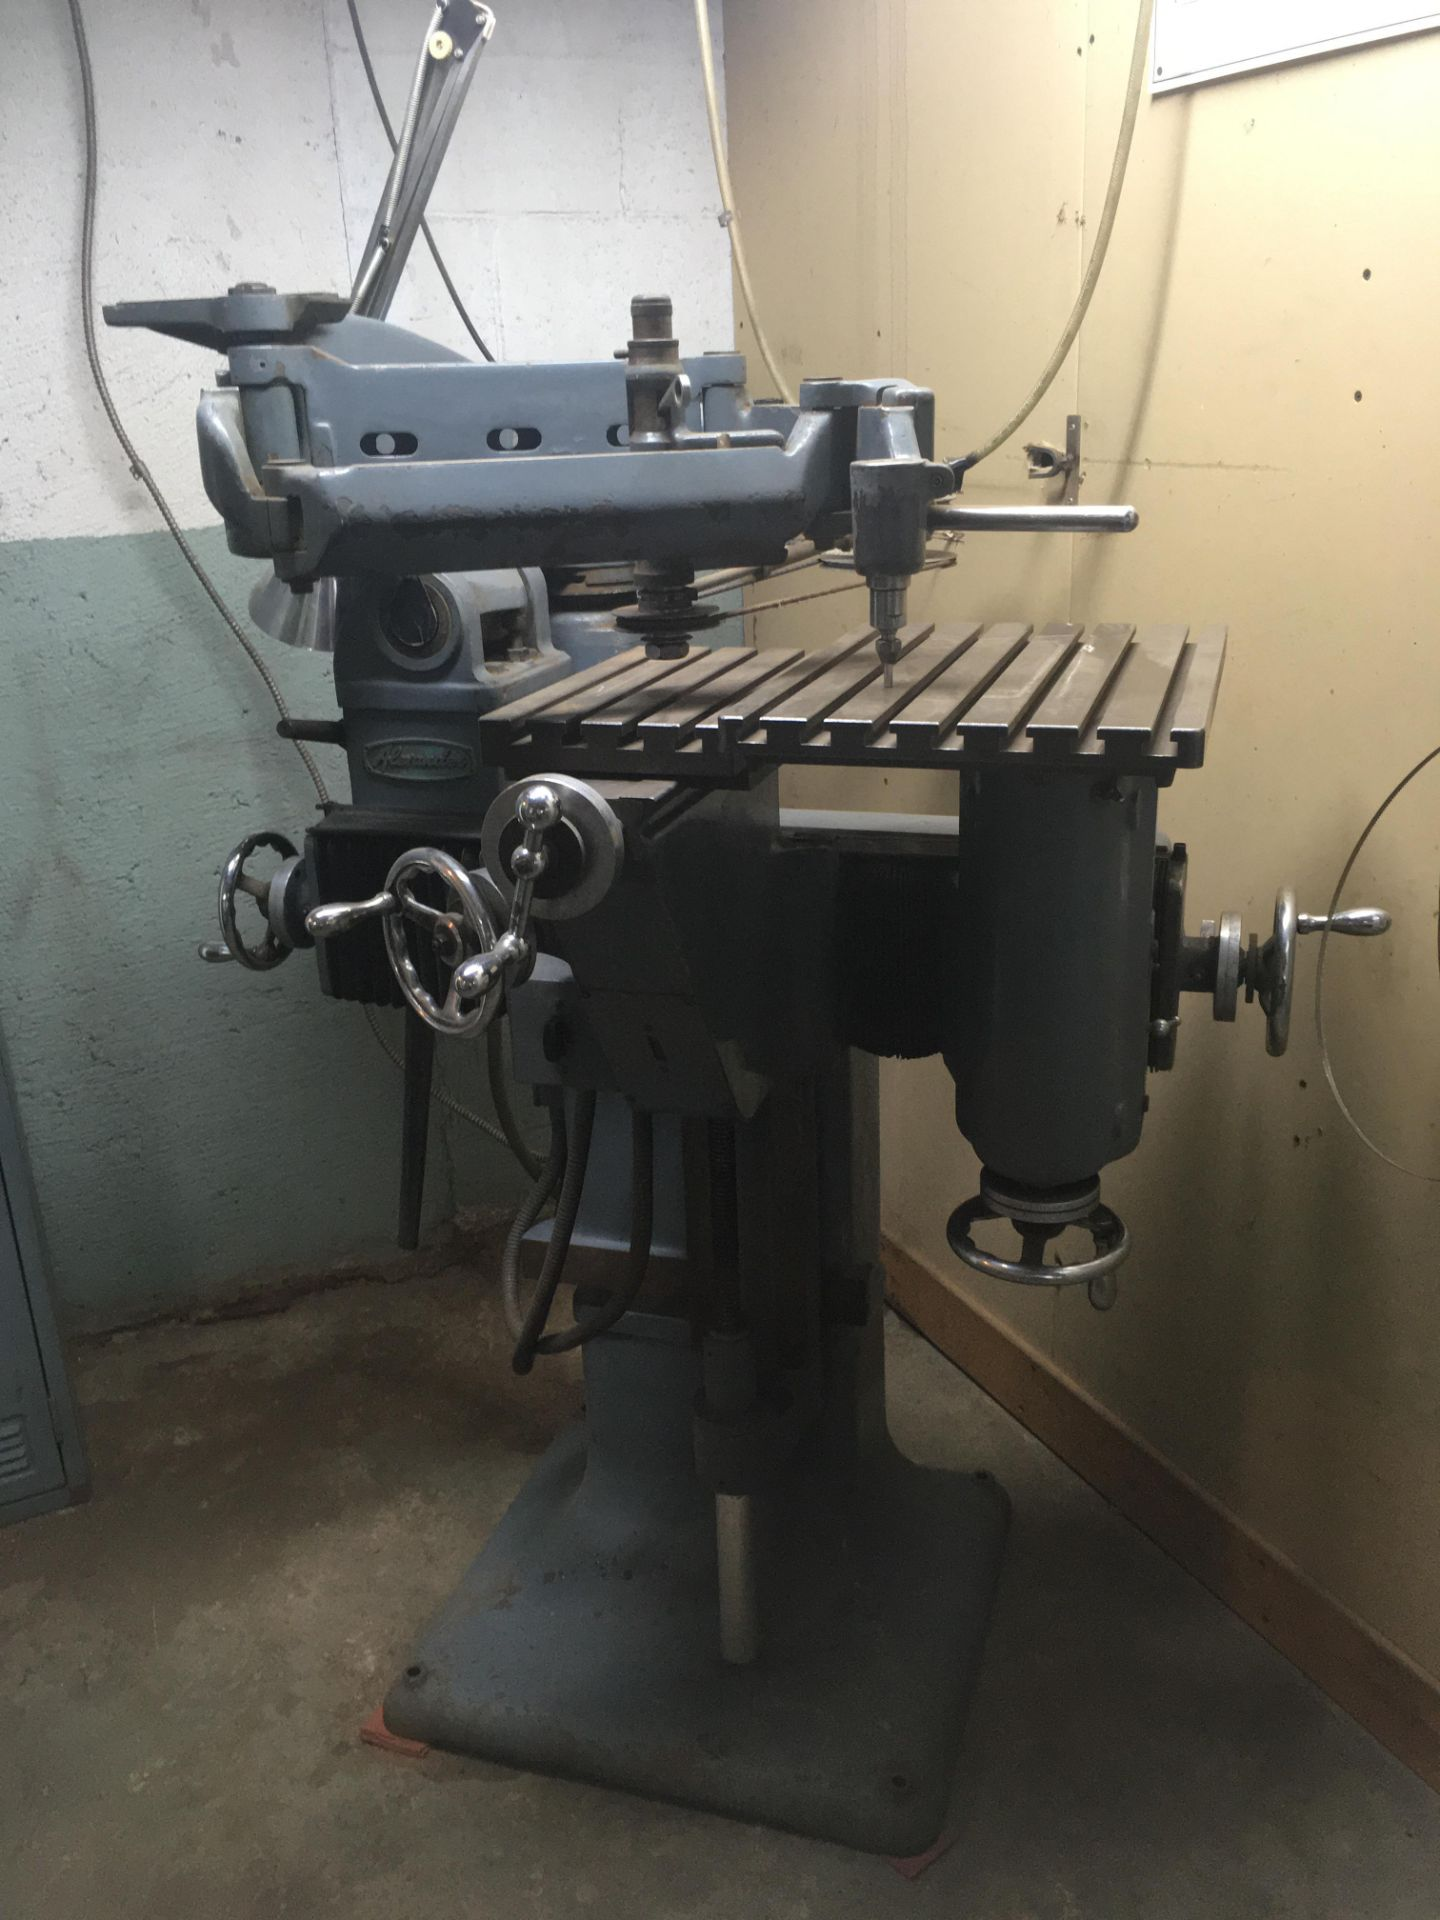 ALEXANDER PENTAGRAPH Machine, mod: 3A, c/w Metal Cabinet & Assorted Parts